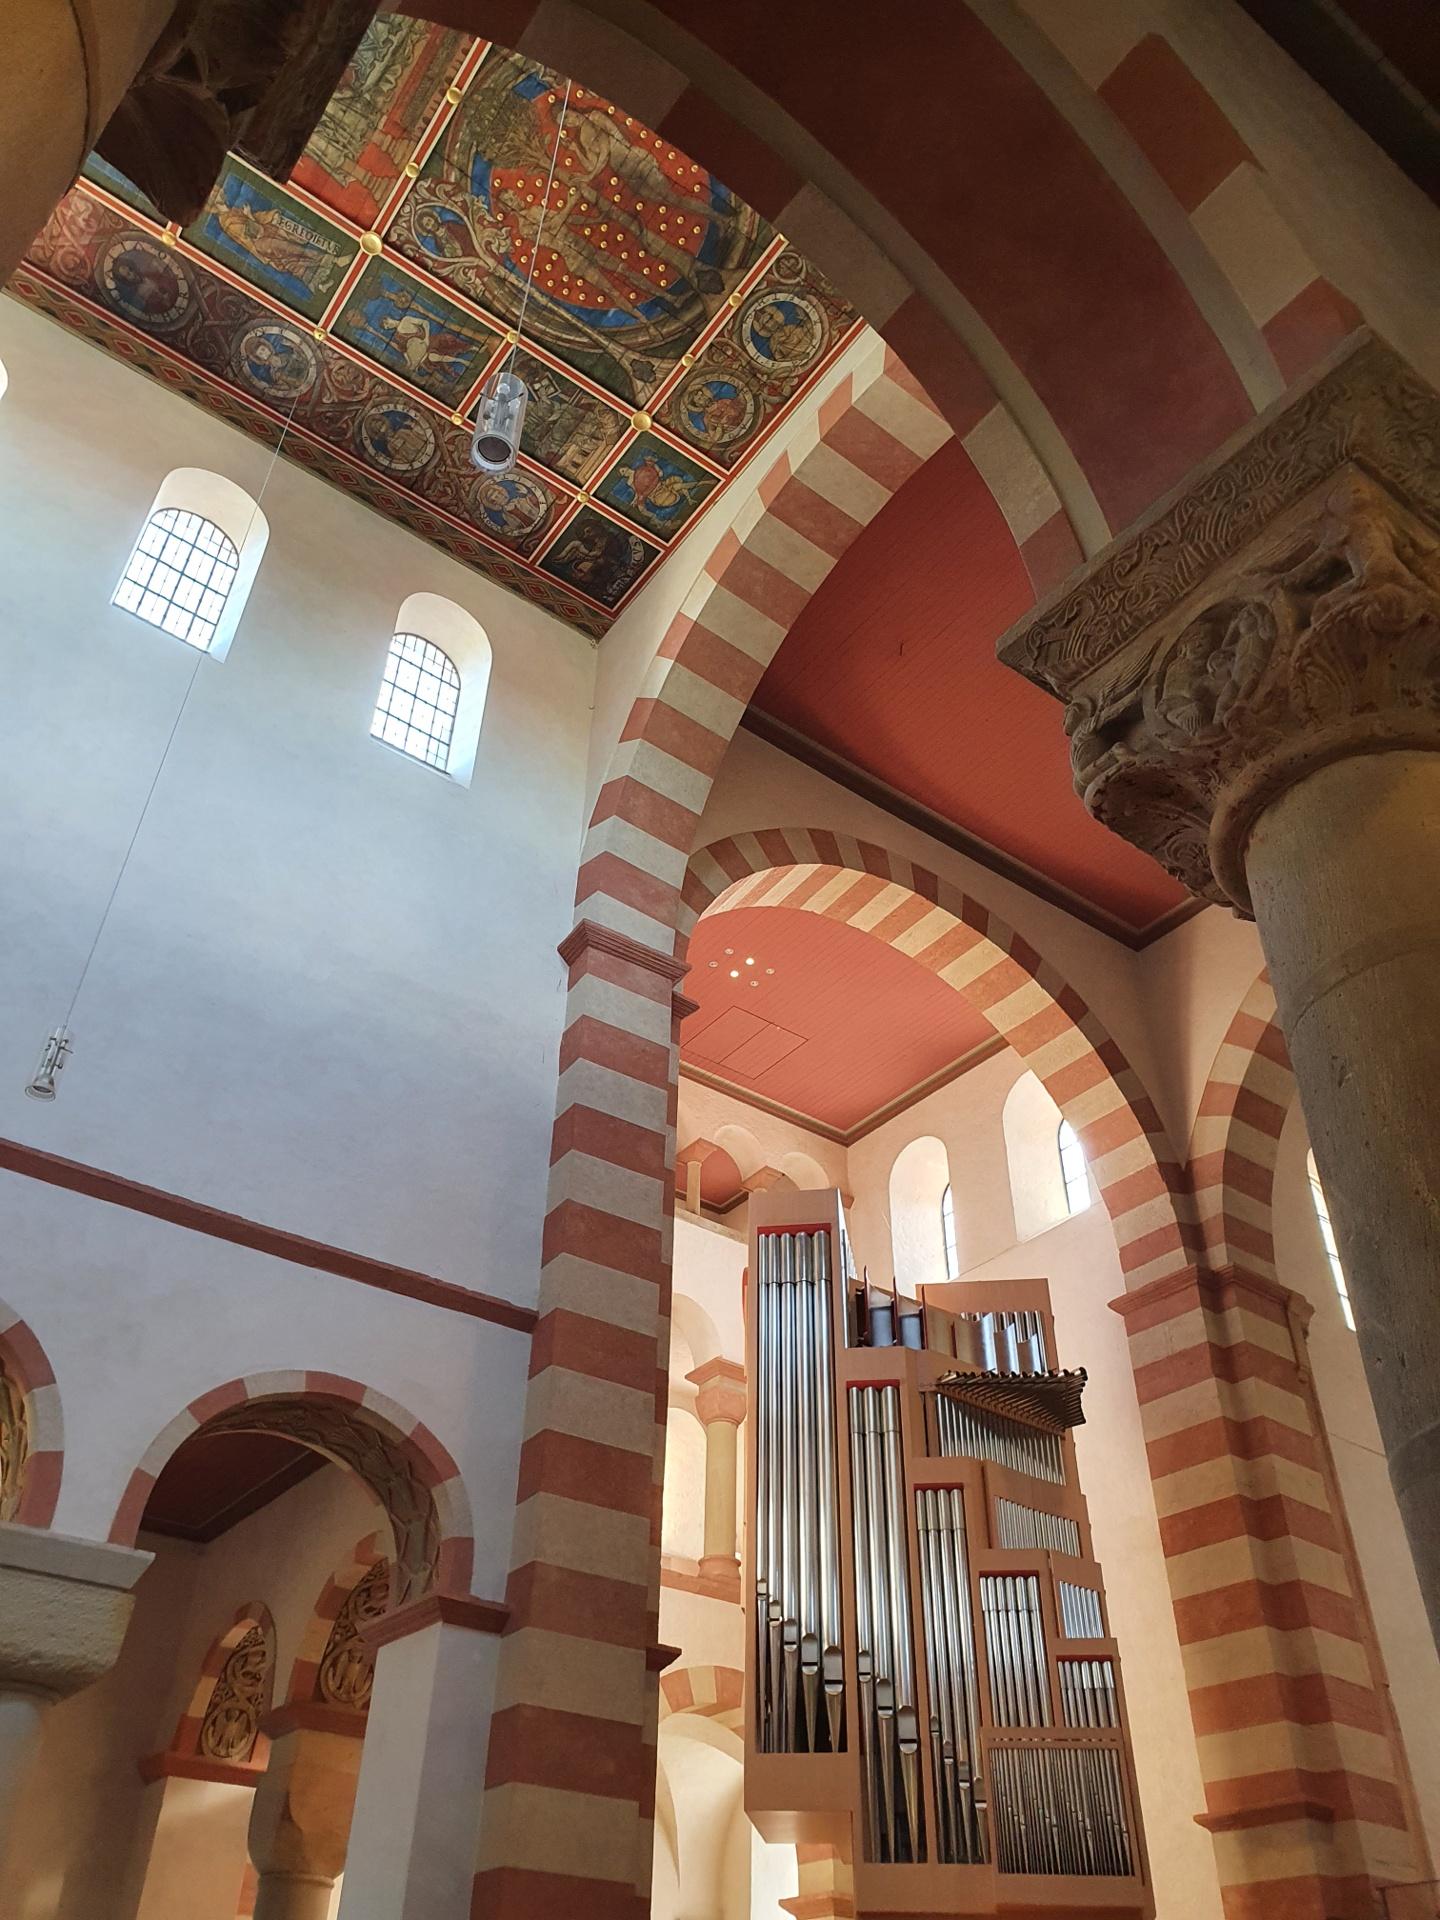 UNESCO St. Michaelis in Hildesheim